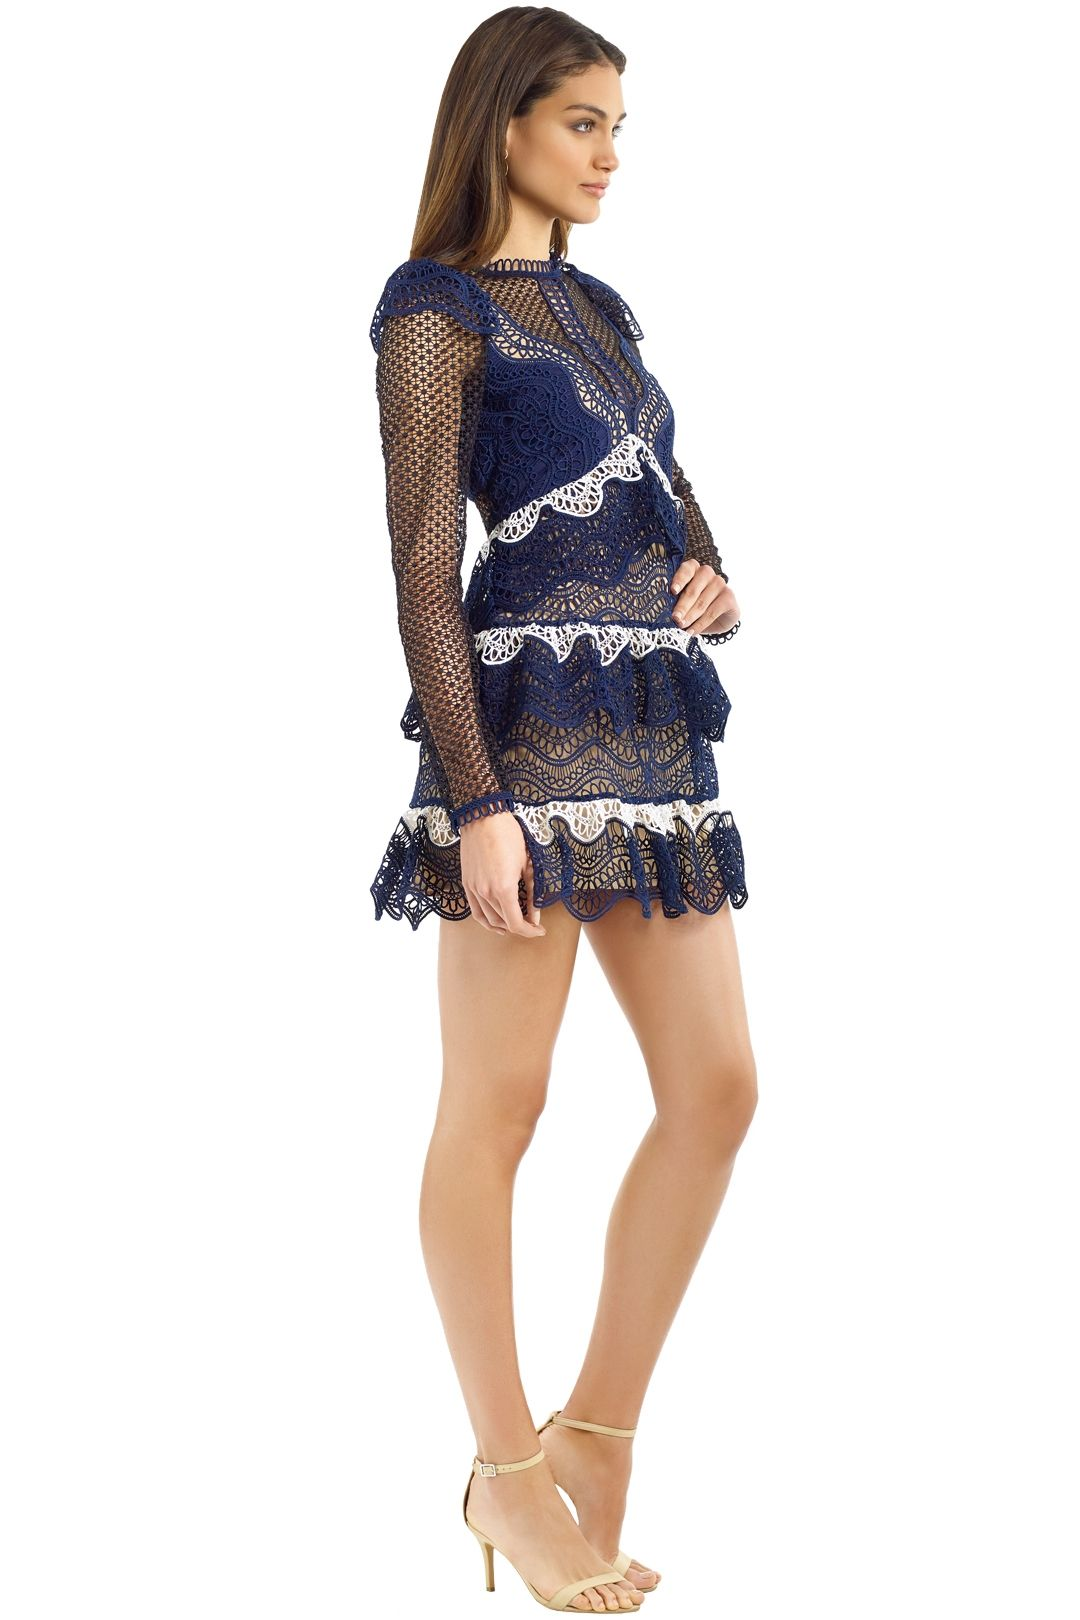 Self Portrait - Wave Guipure Mini Dress - Navy - Side